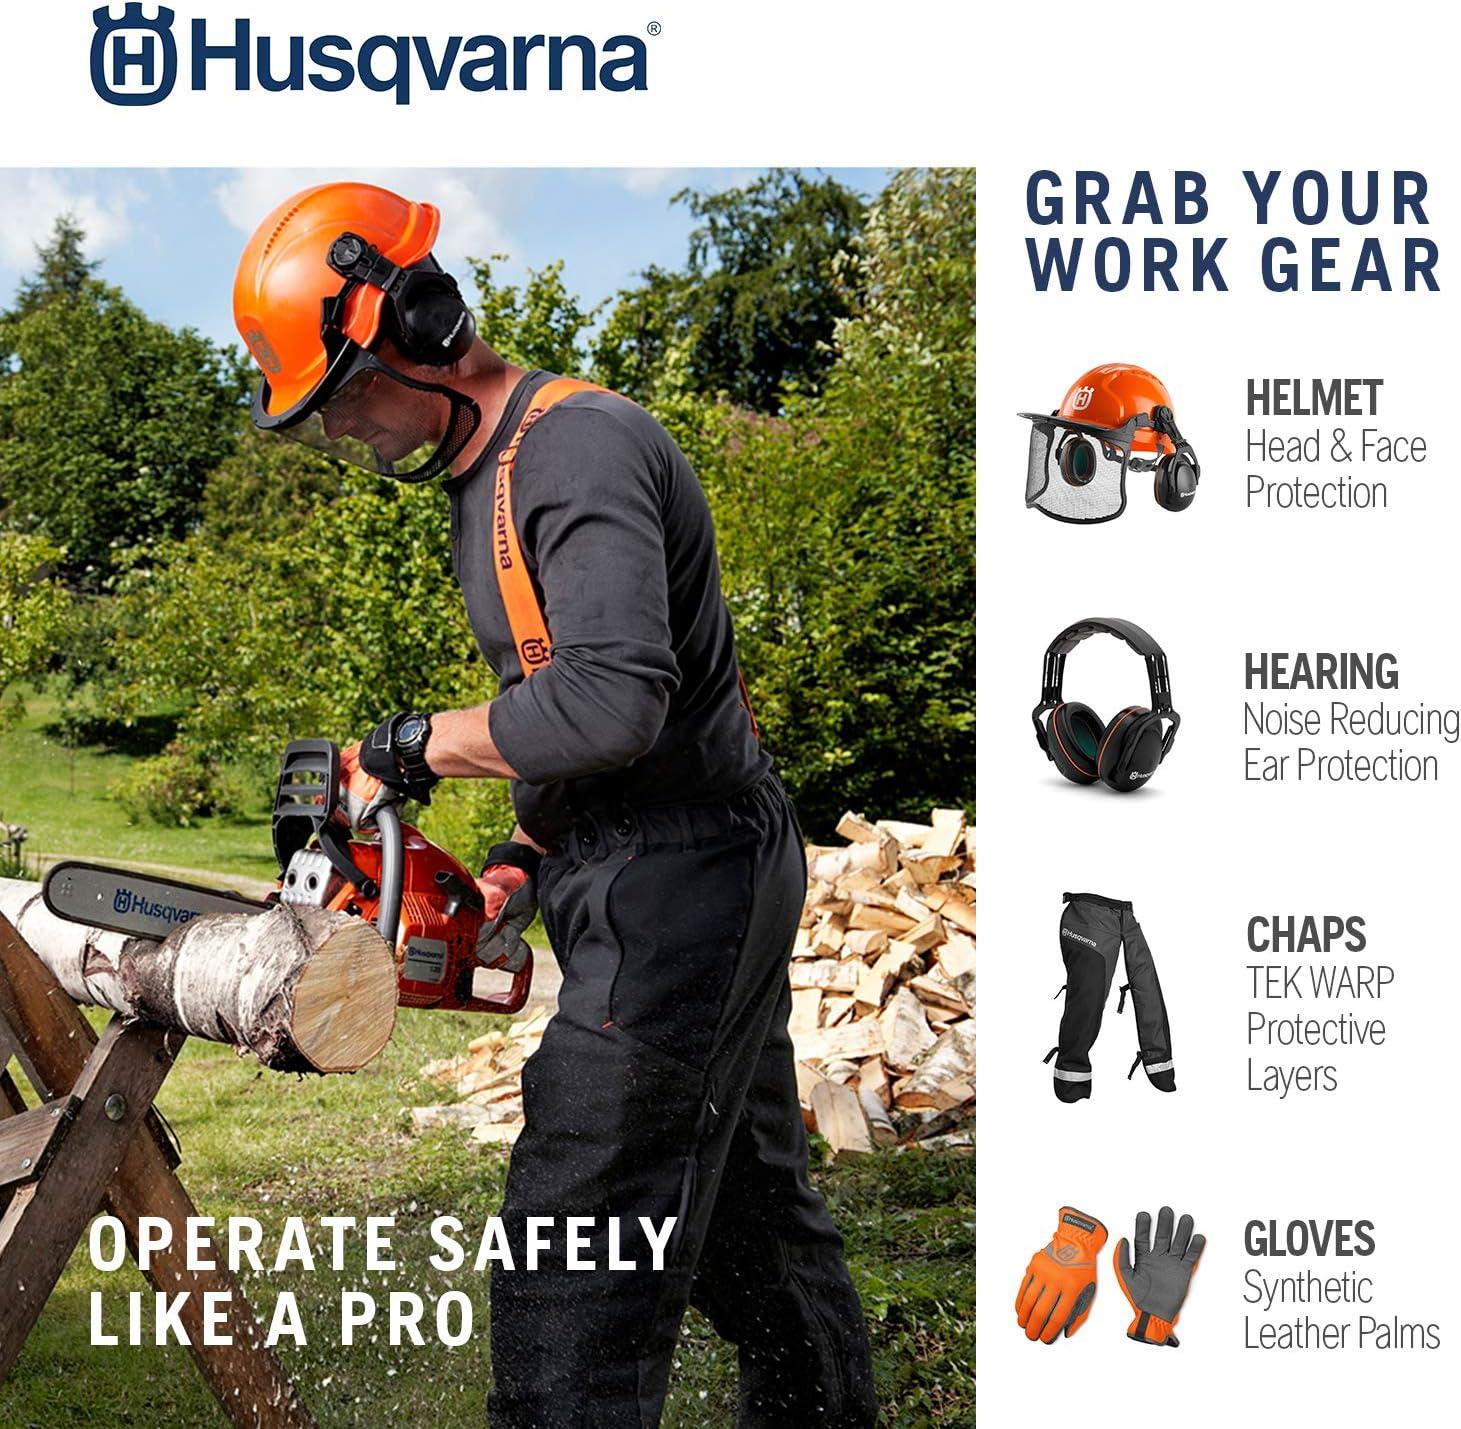 Husqvarna 120 Mark II 16 in. product image 6